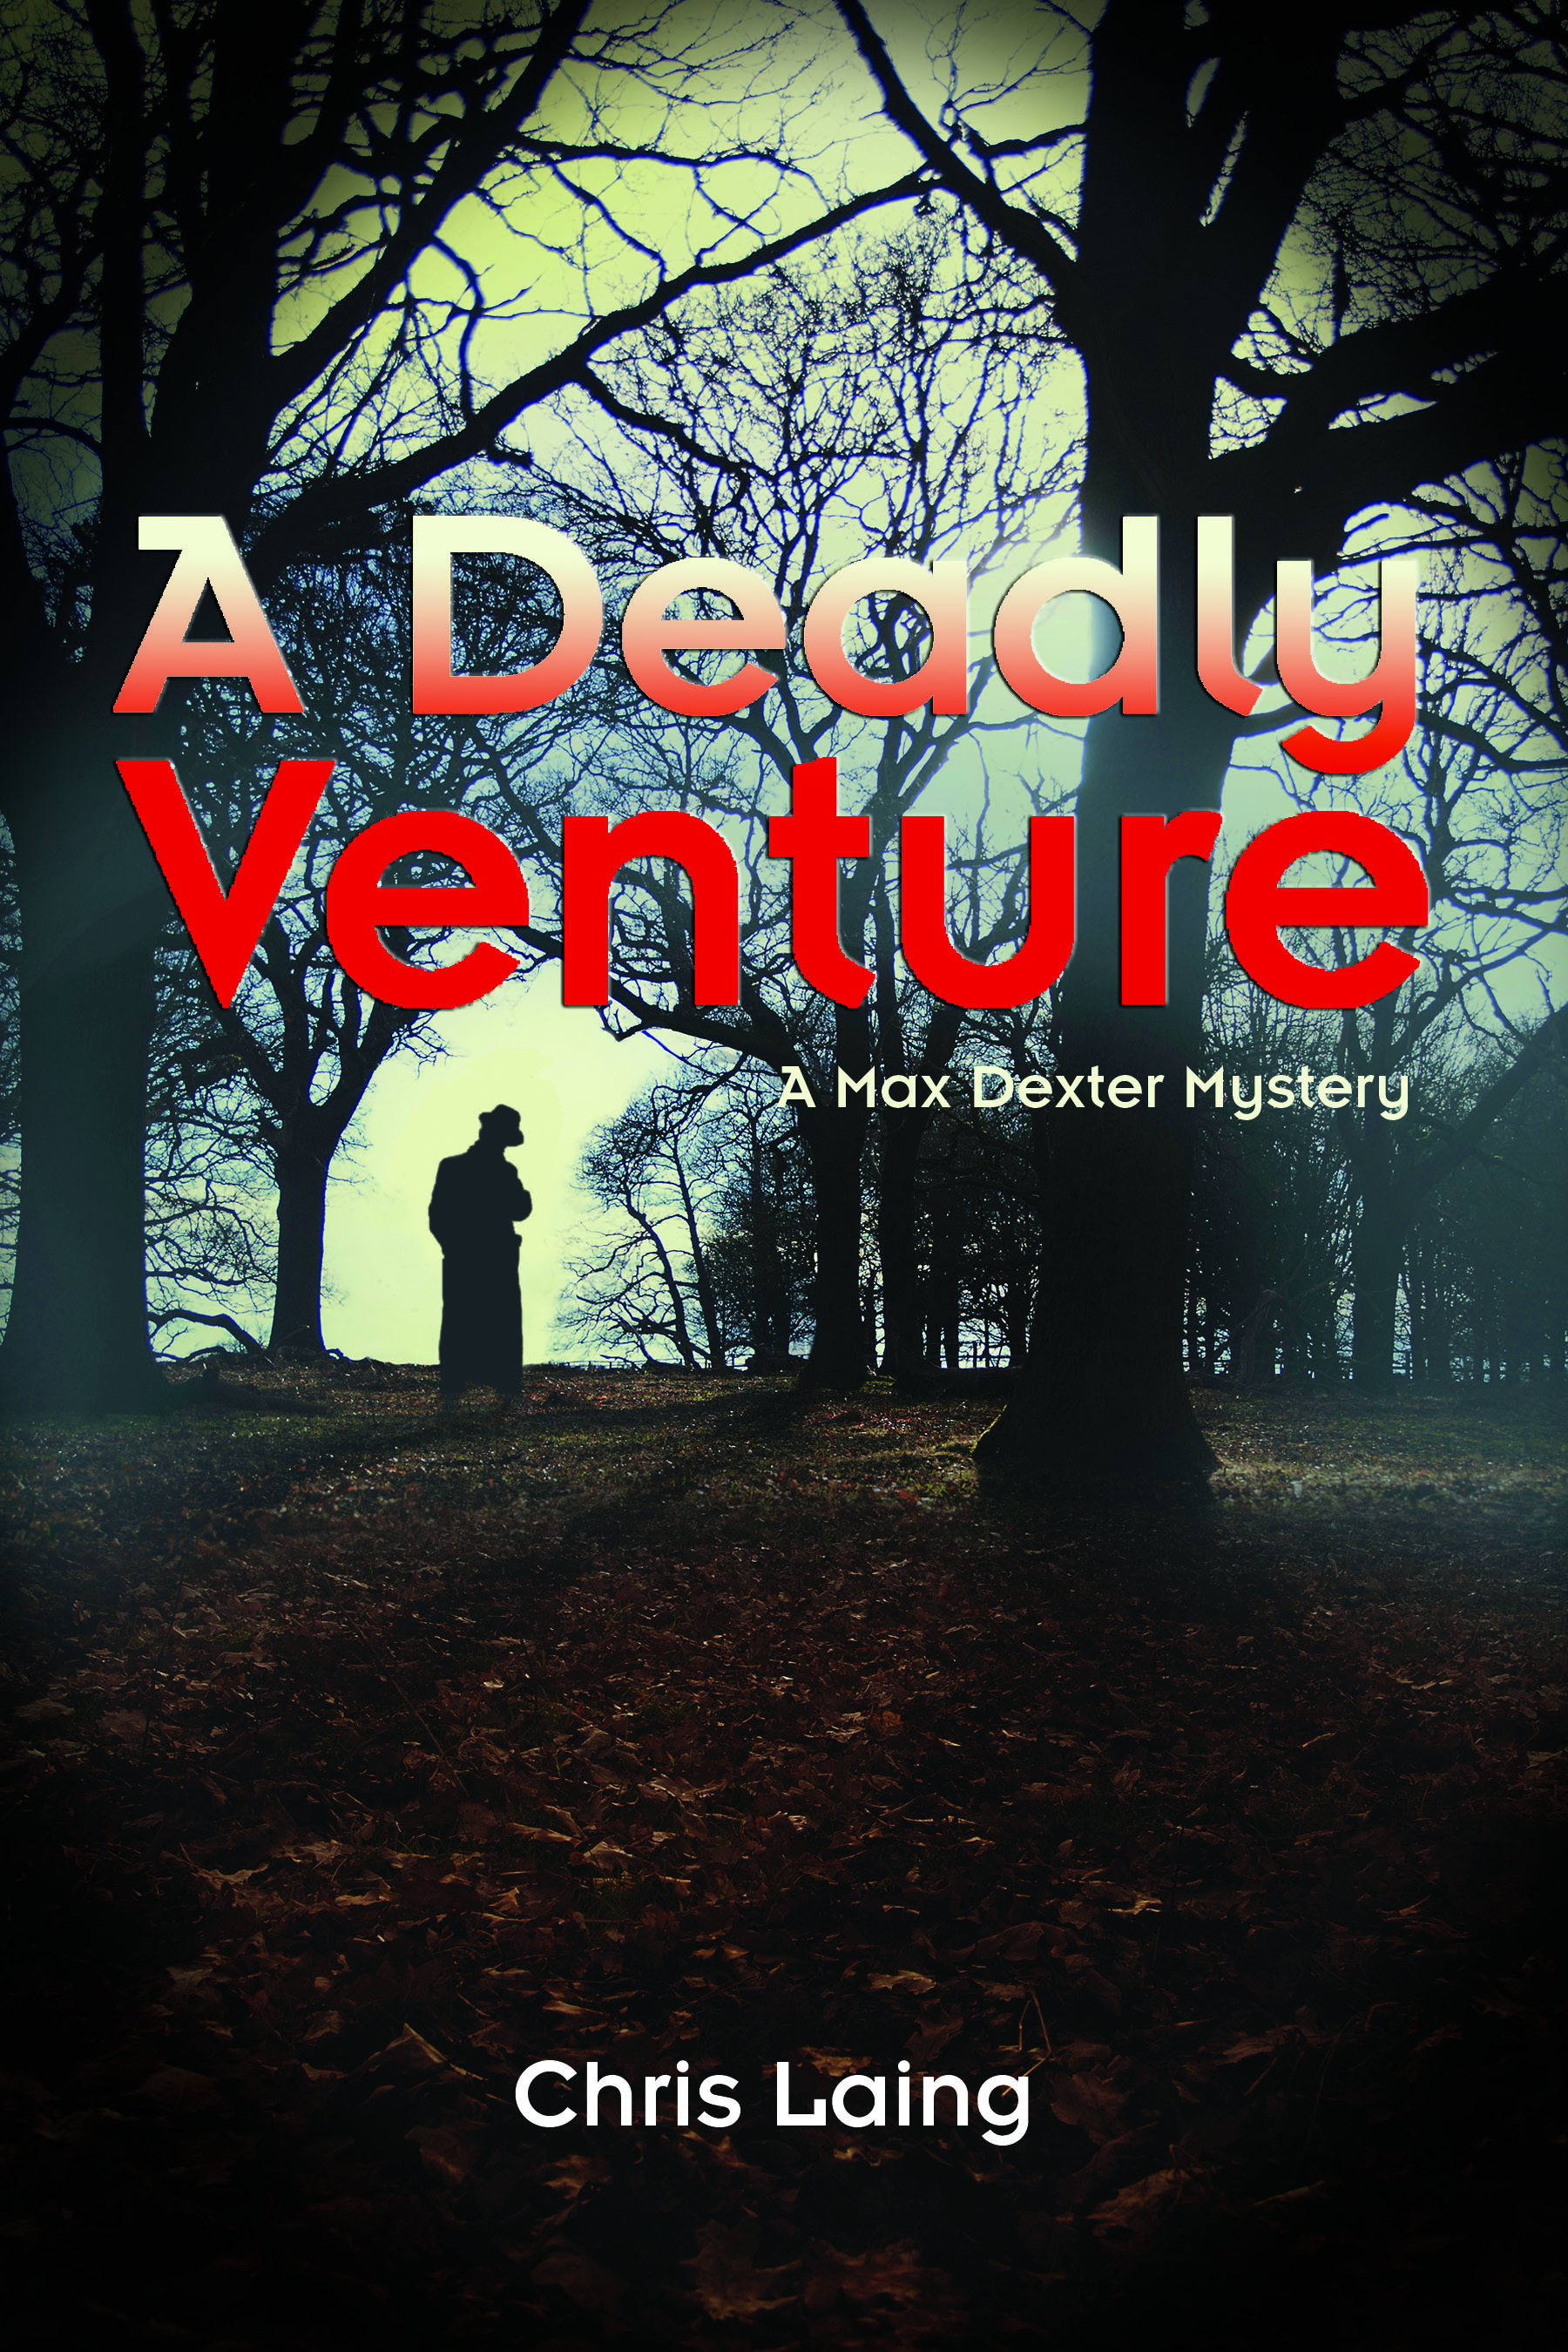 a_deadly_venture